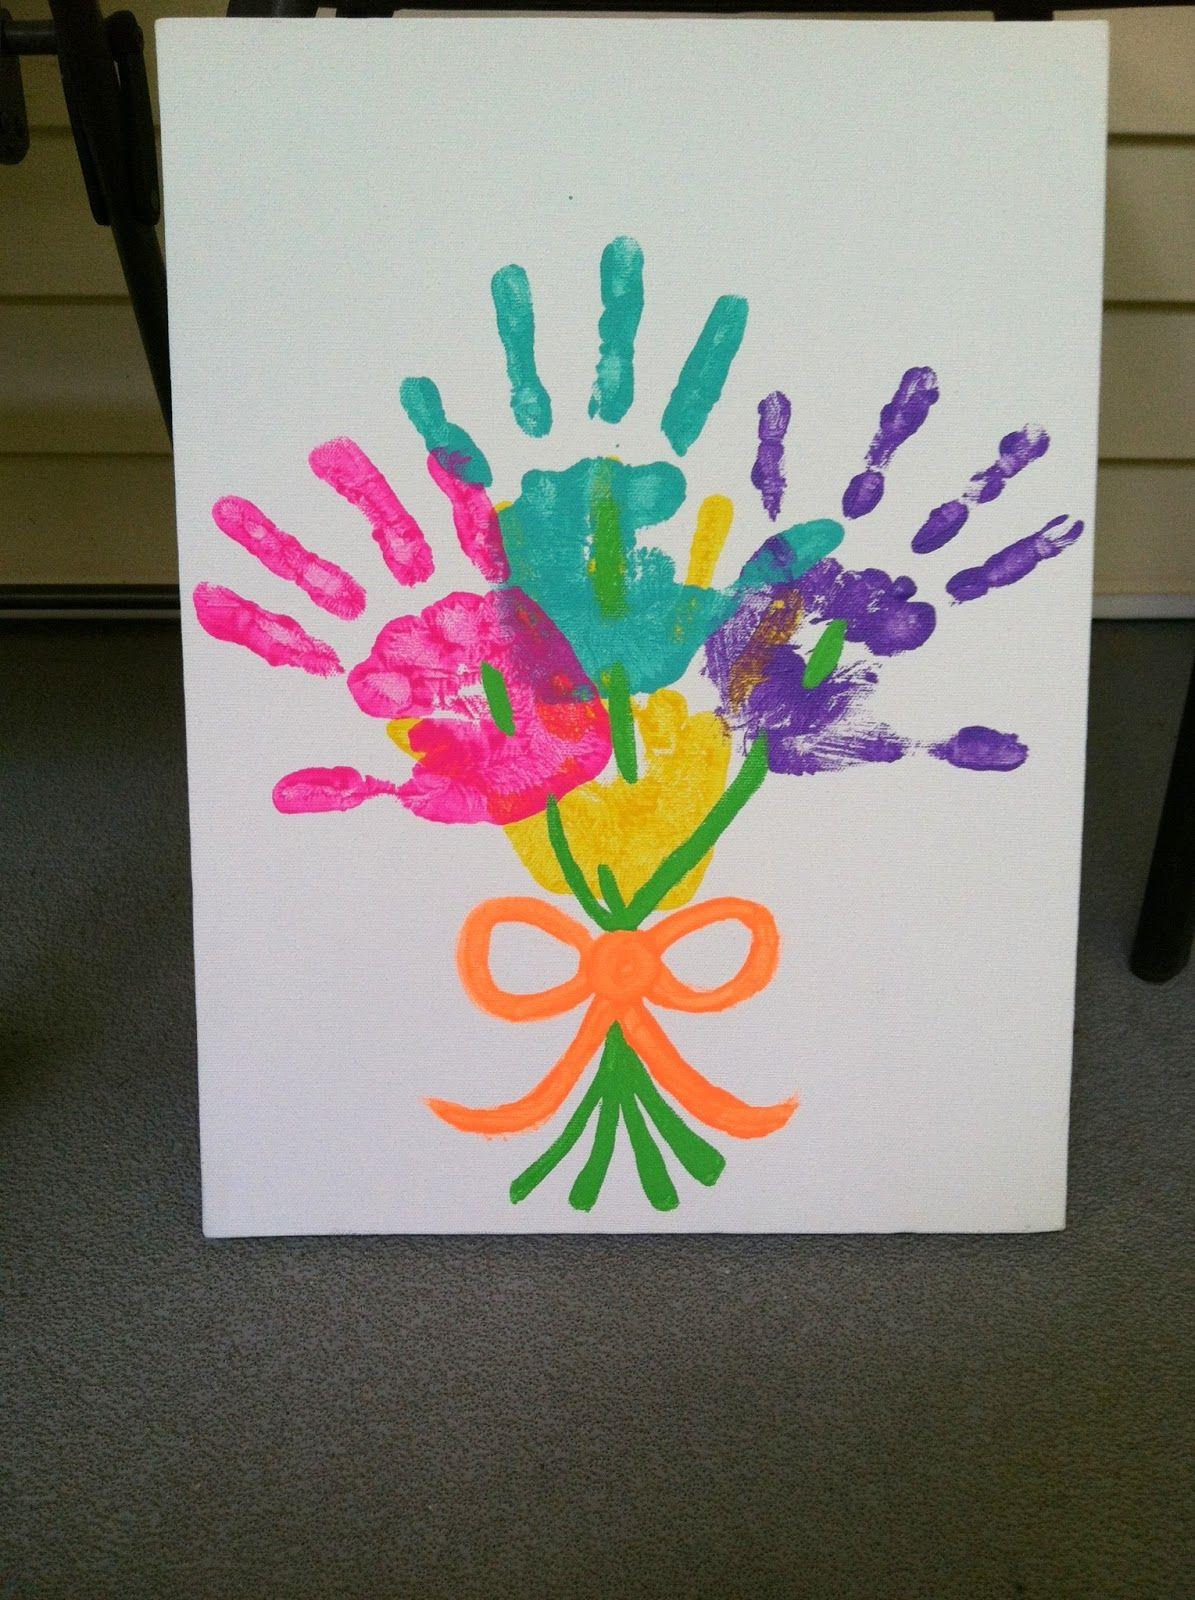 Сушивок оптом, открытка для бабушки от внука 2 года